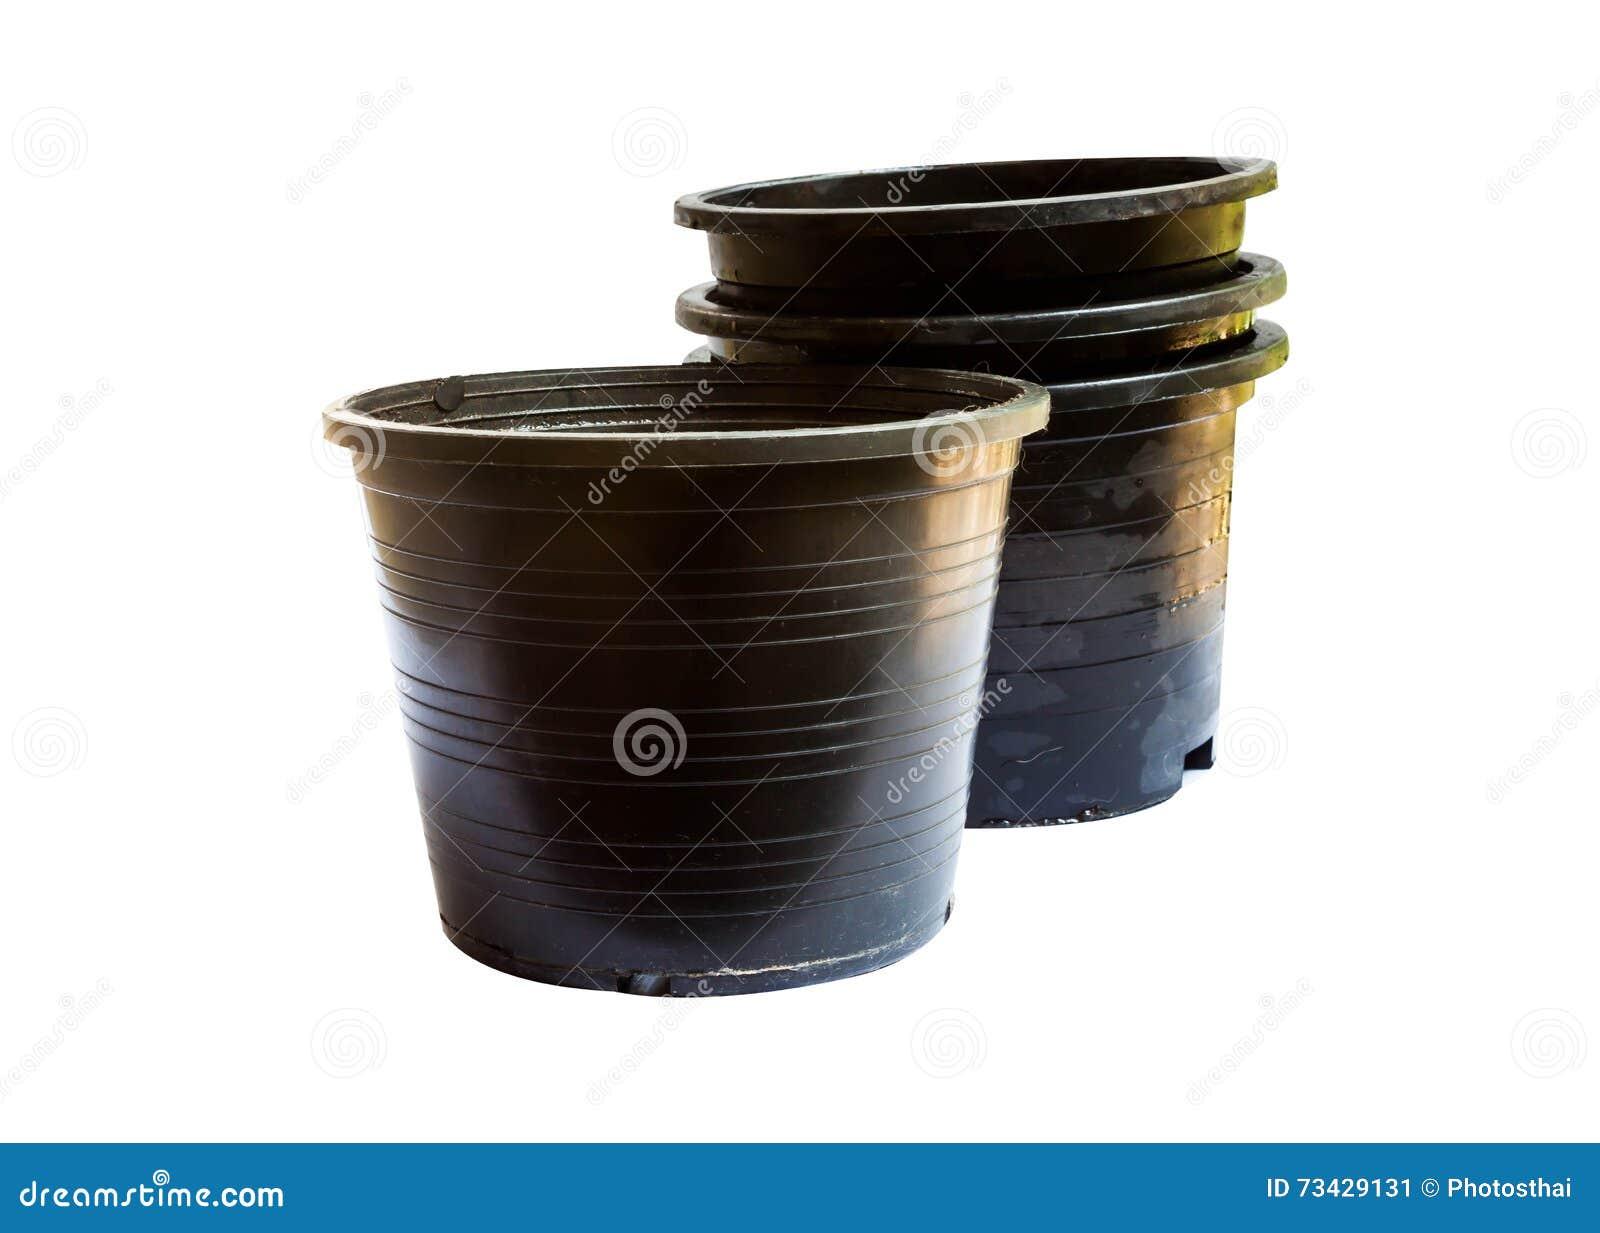 Vasi Neri In Plastica.Vasi Di Plastica Neri Della Pianta Immagine Stock Immagine